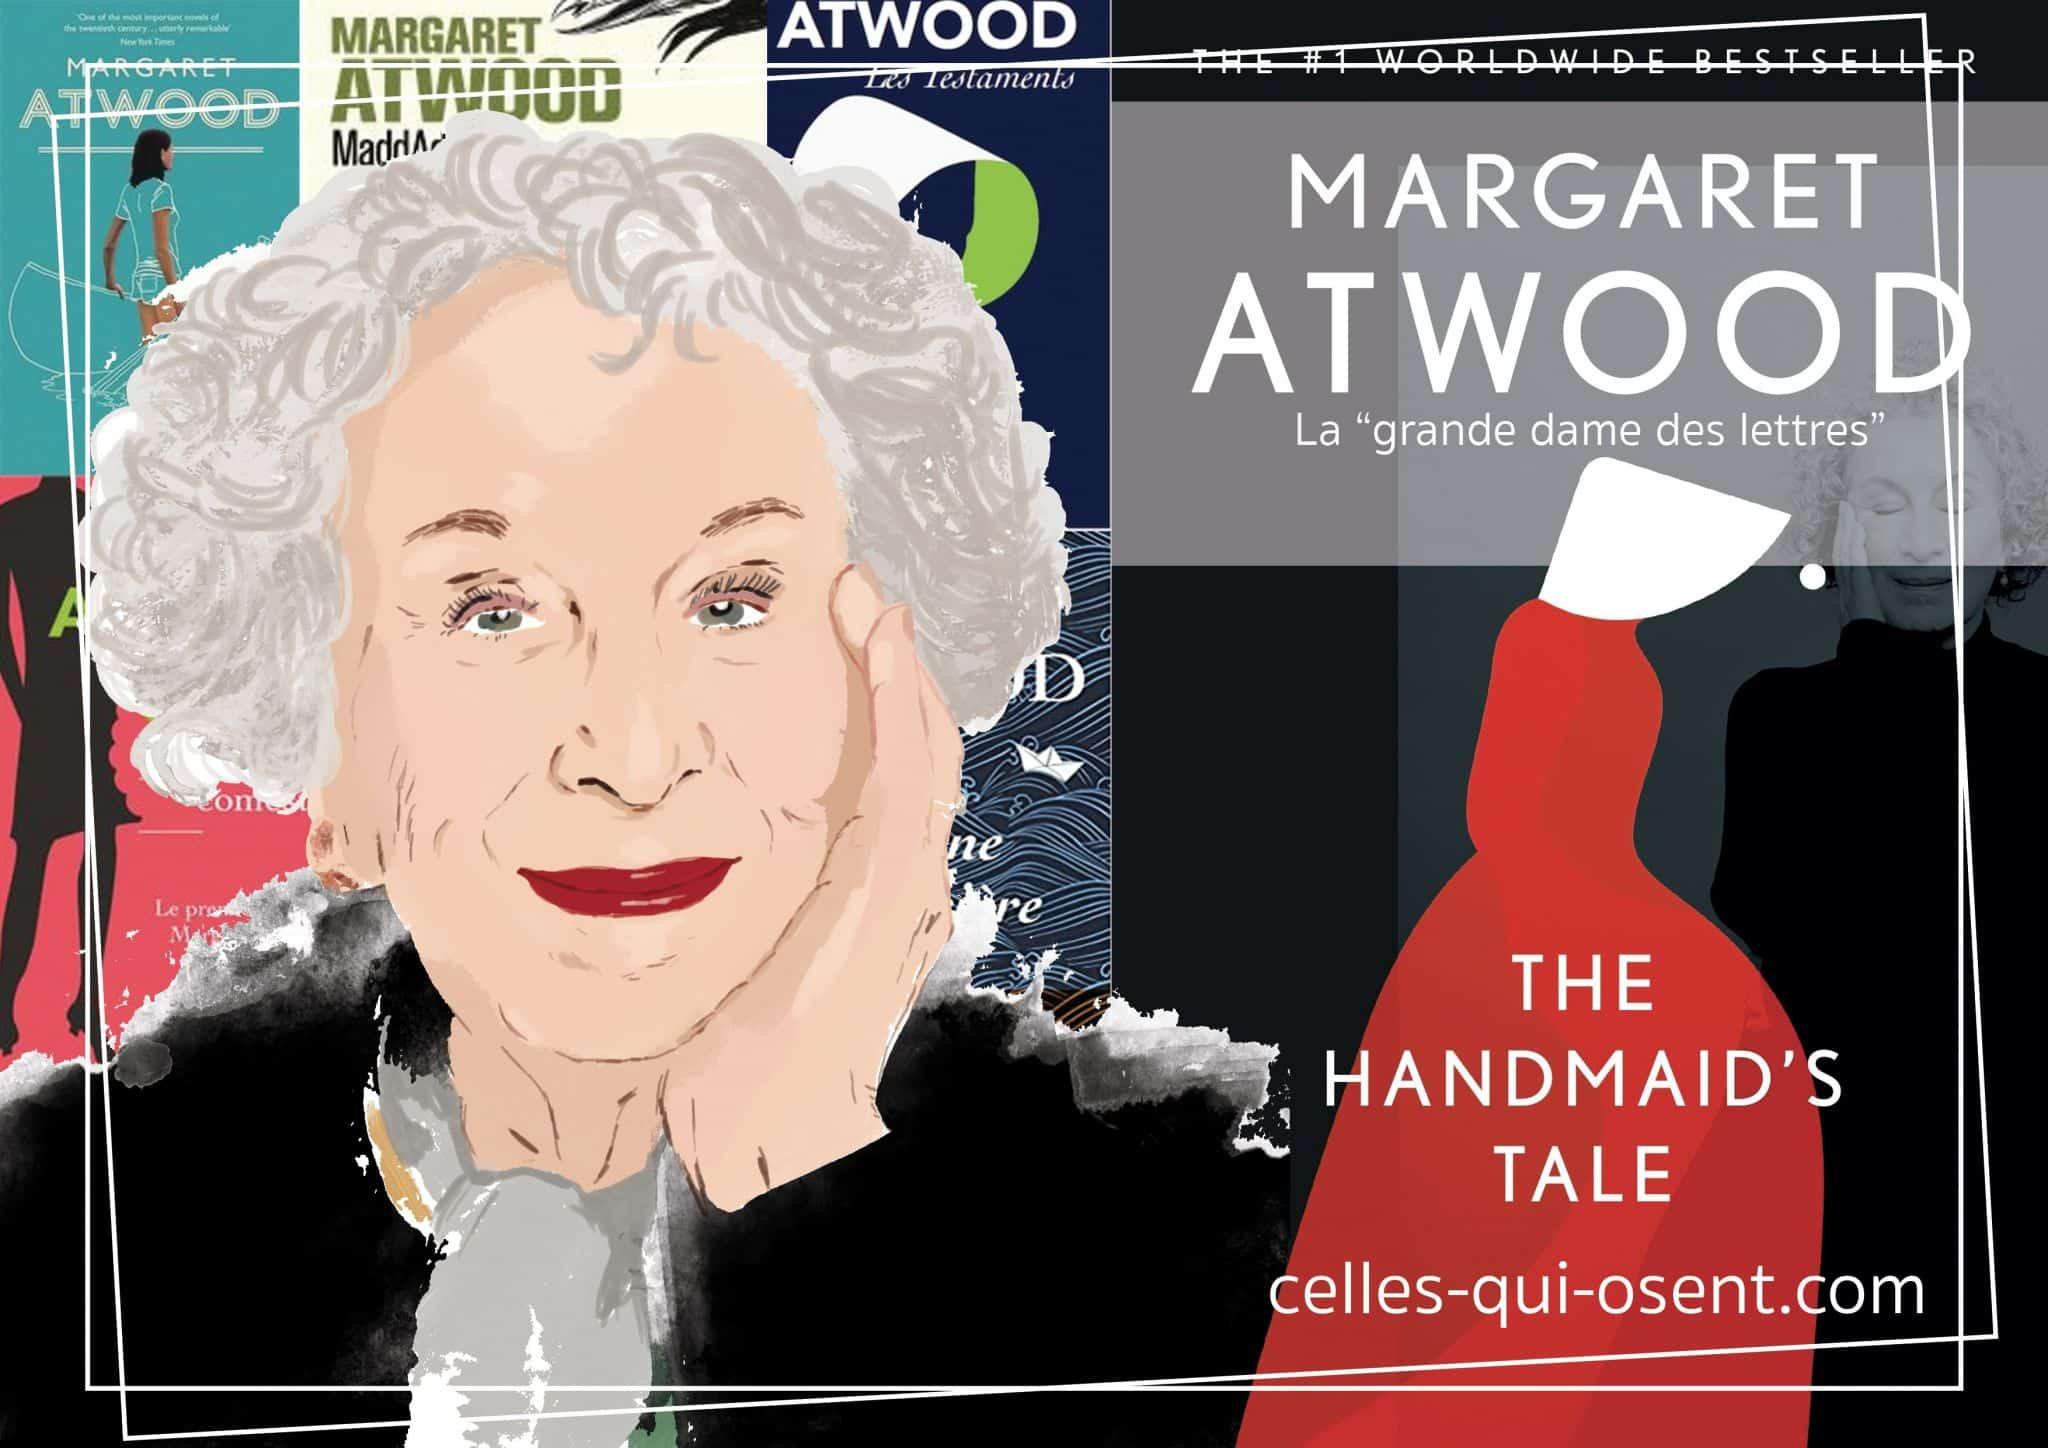 margaret-atwood-celles-qui-osent